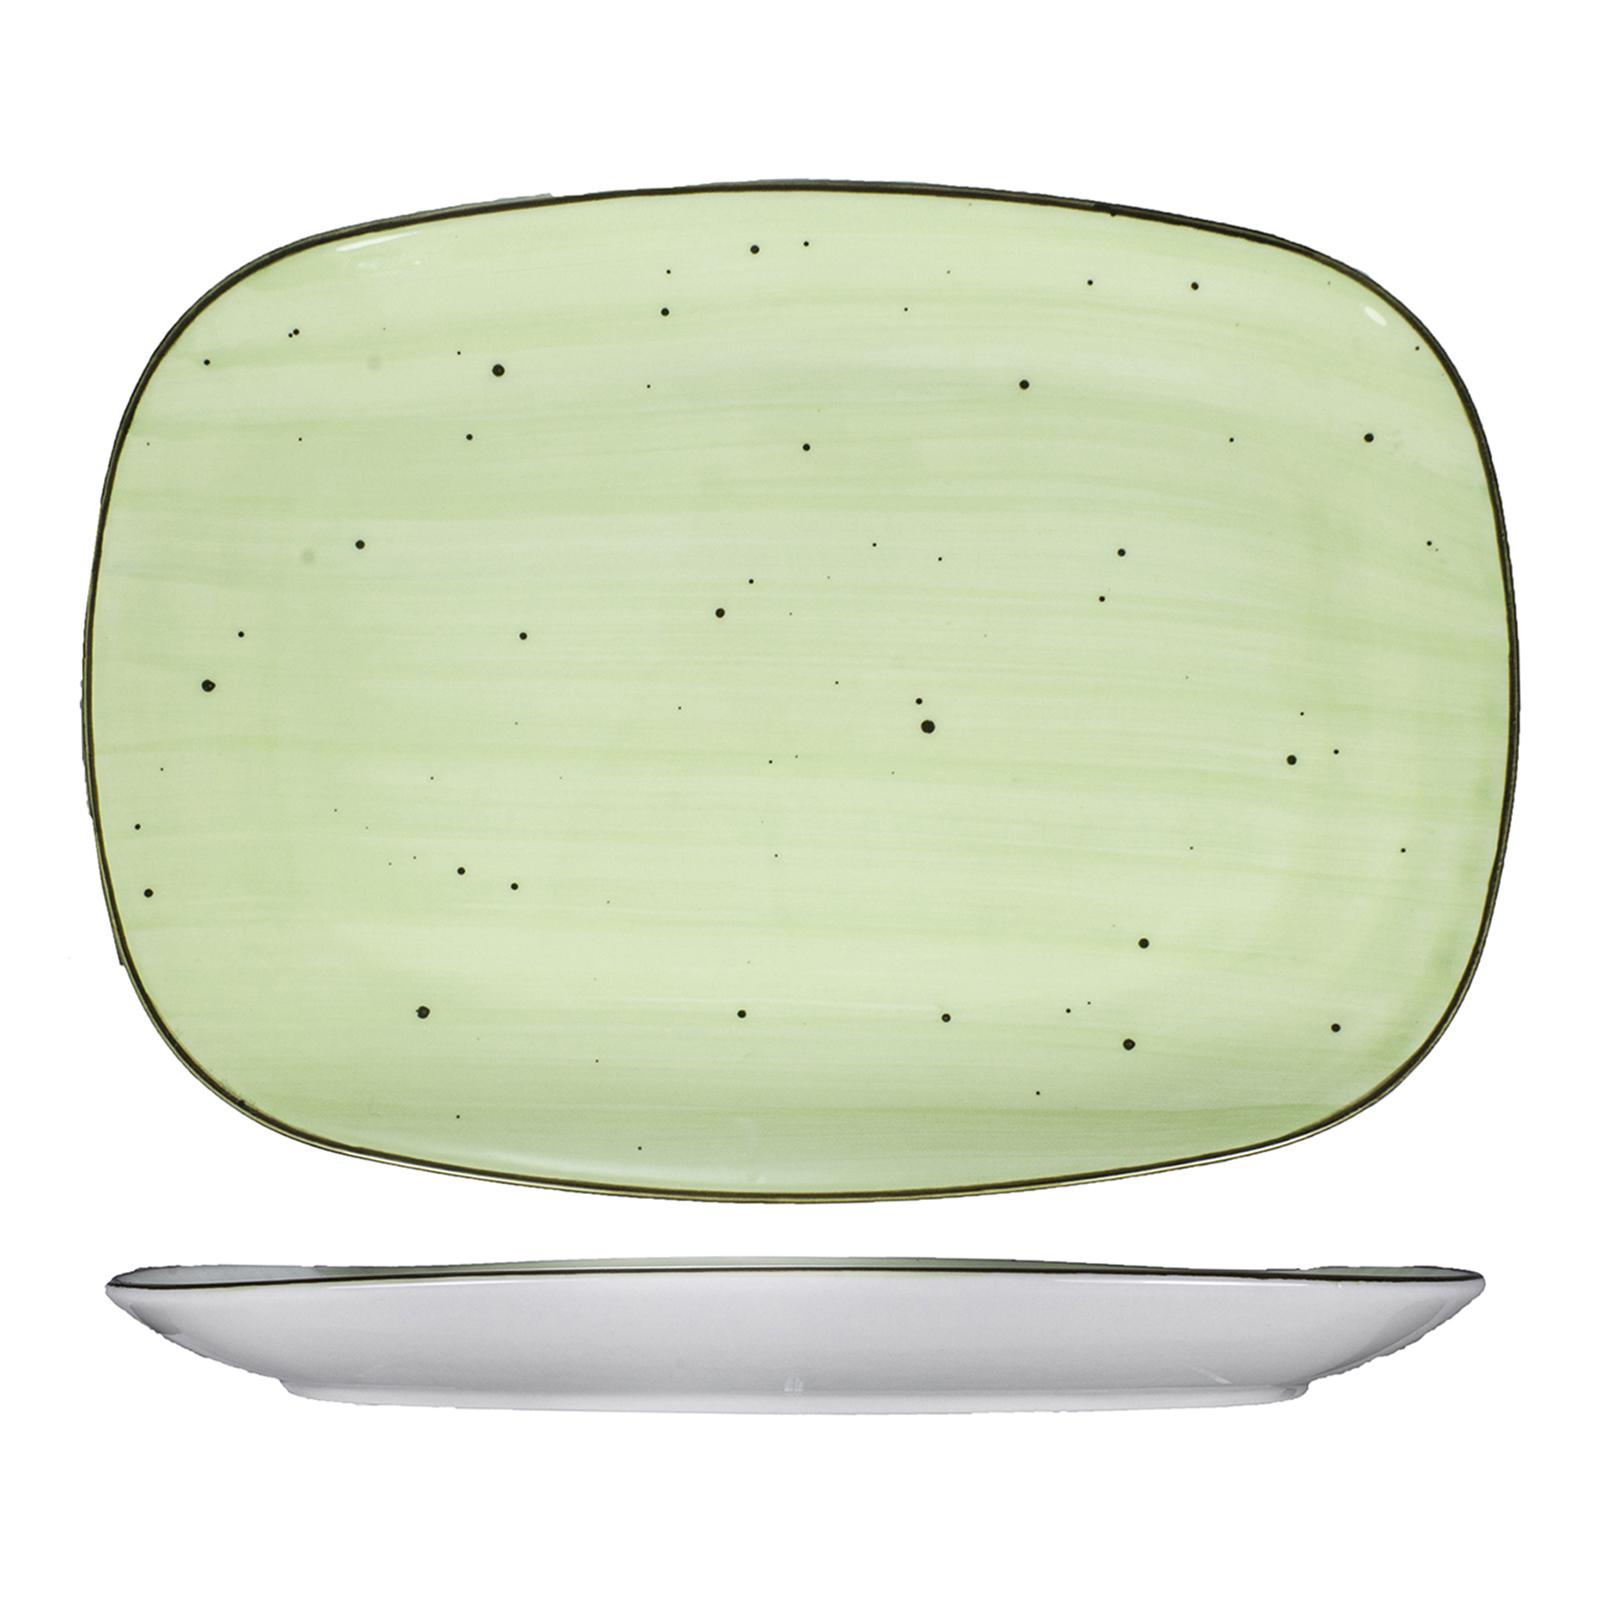 International Tableware RT-14-LI platter, china